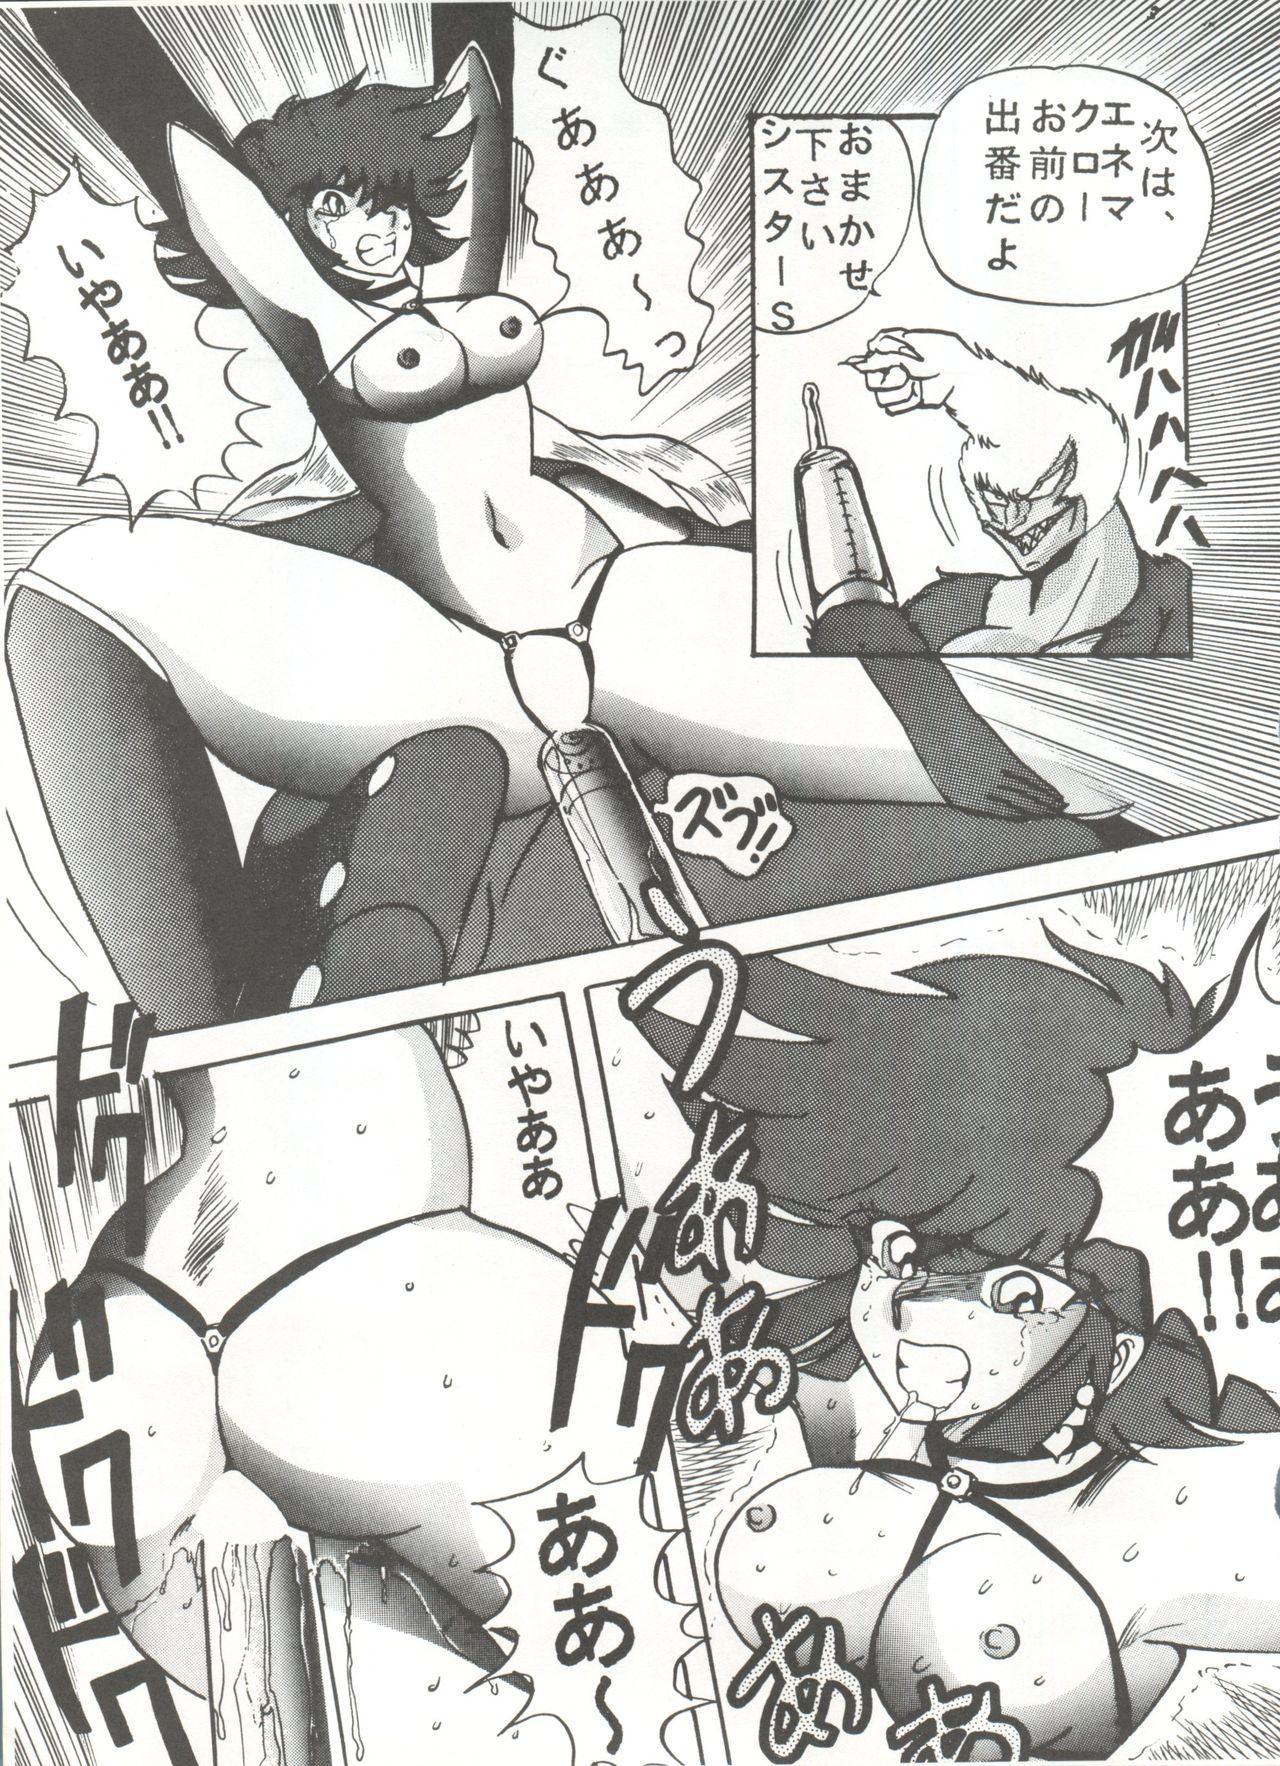 [Global One (MARO)] Sadistic 5 (Cutey Honey, Devilman, Sailor Moon), [Global One (MARO)] Sadistic (Dirty Pair, Fushigi no Umi no Nadia, Sailor Moon), [Studio Ikkatsumajin] .ribbon (Hime-chan's Ribbon) 22